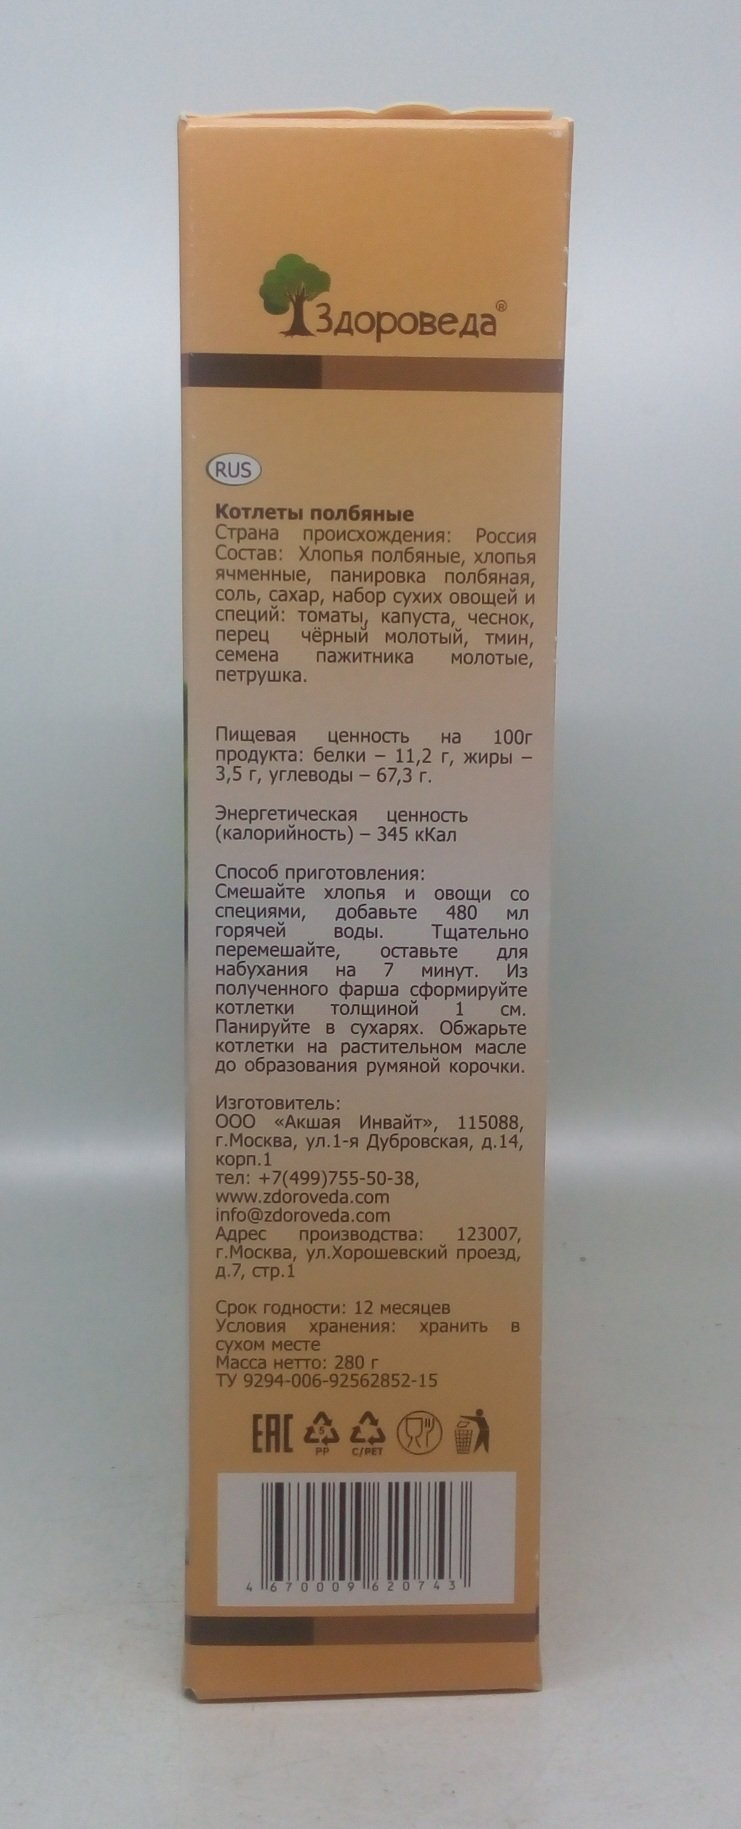 Котлеты полбяные 280г здороведа